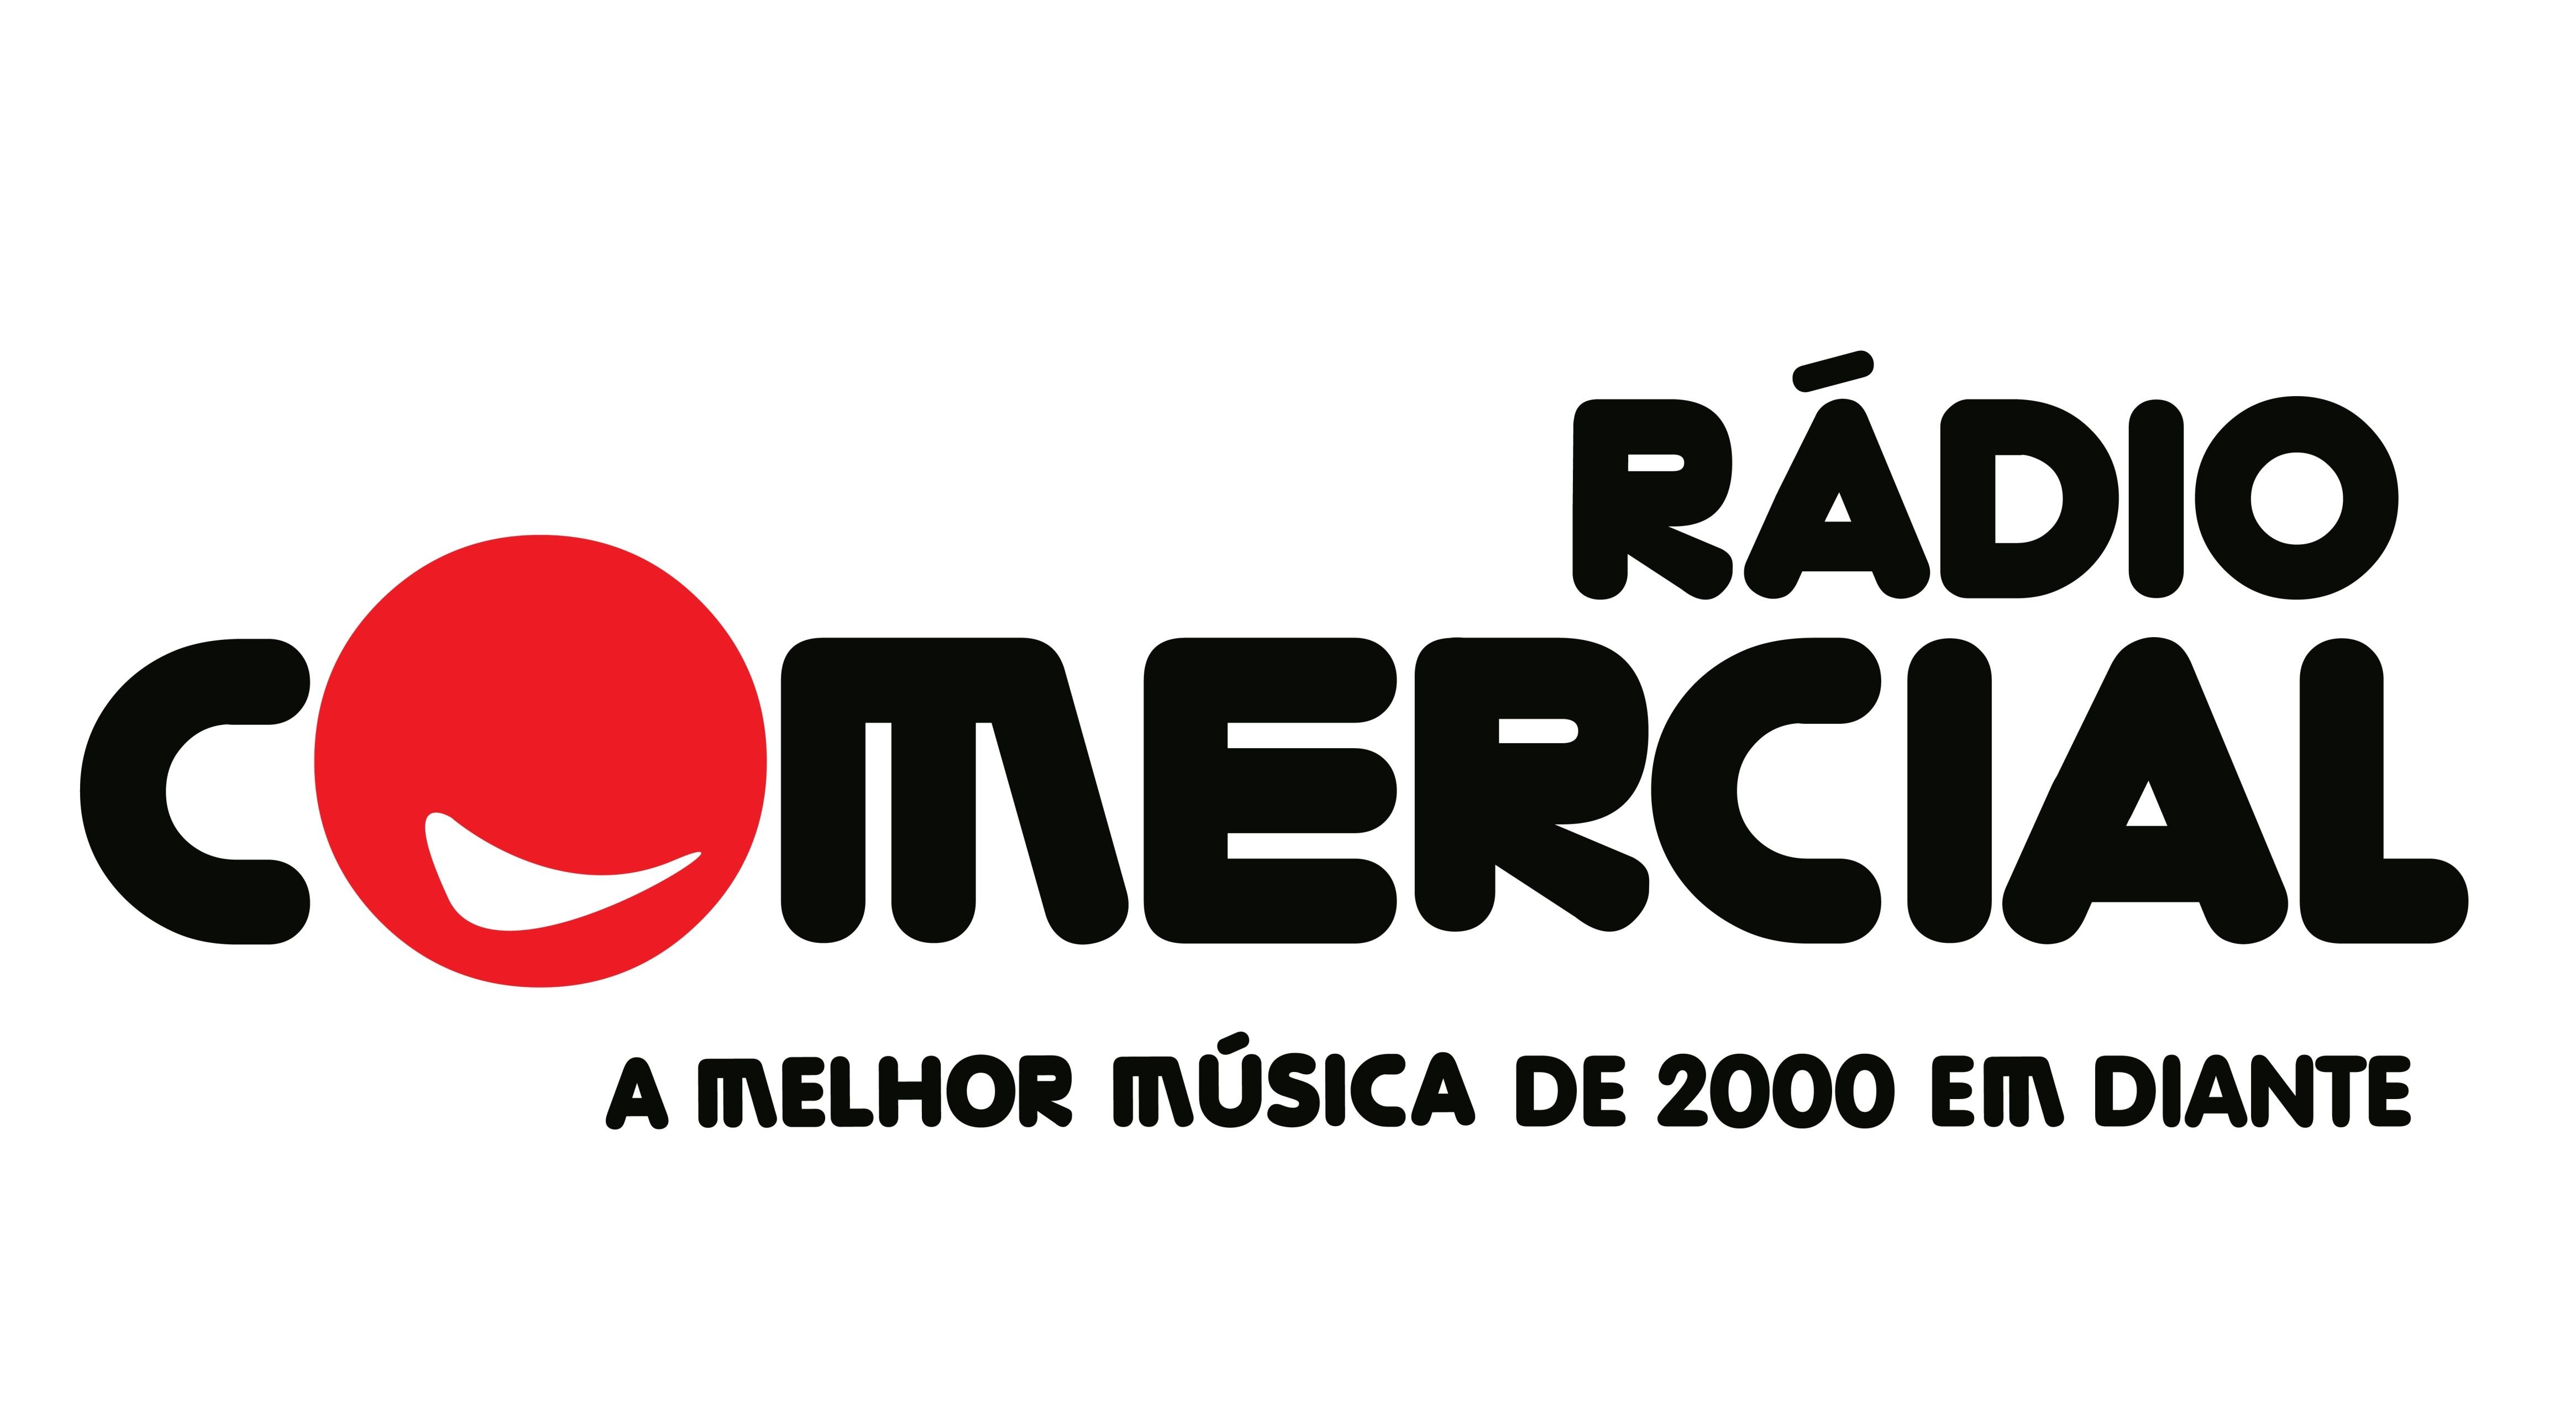 Rádio Comercial é a Rádio Oficial do iTunes Festival